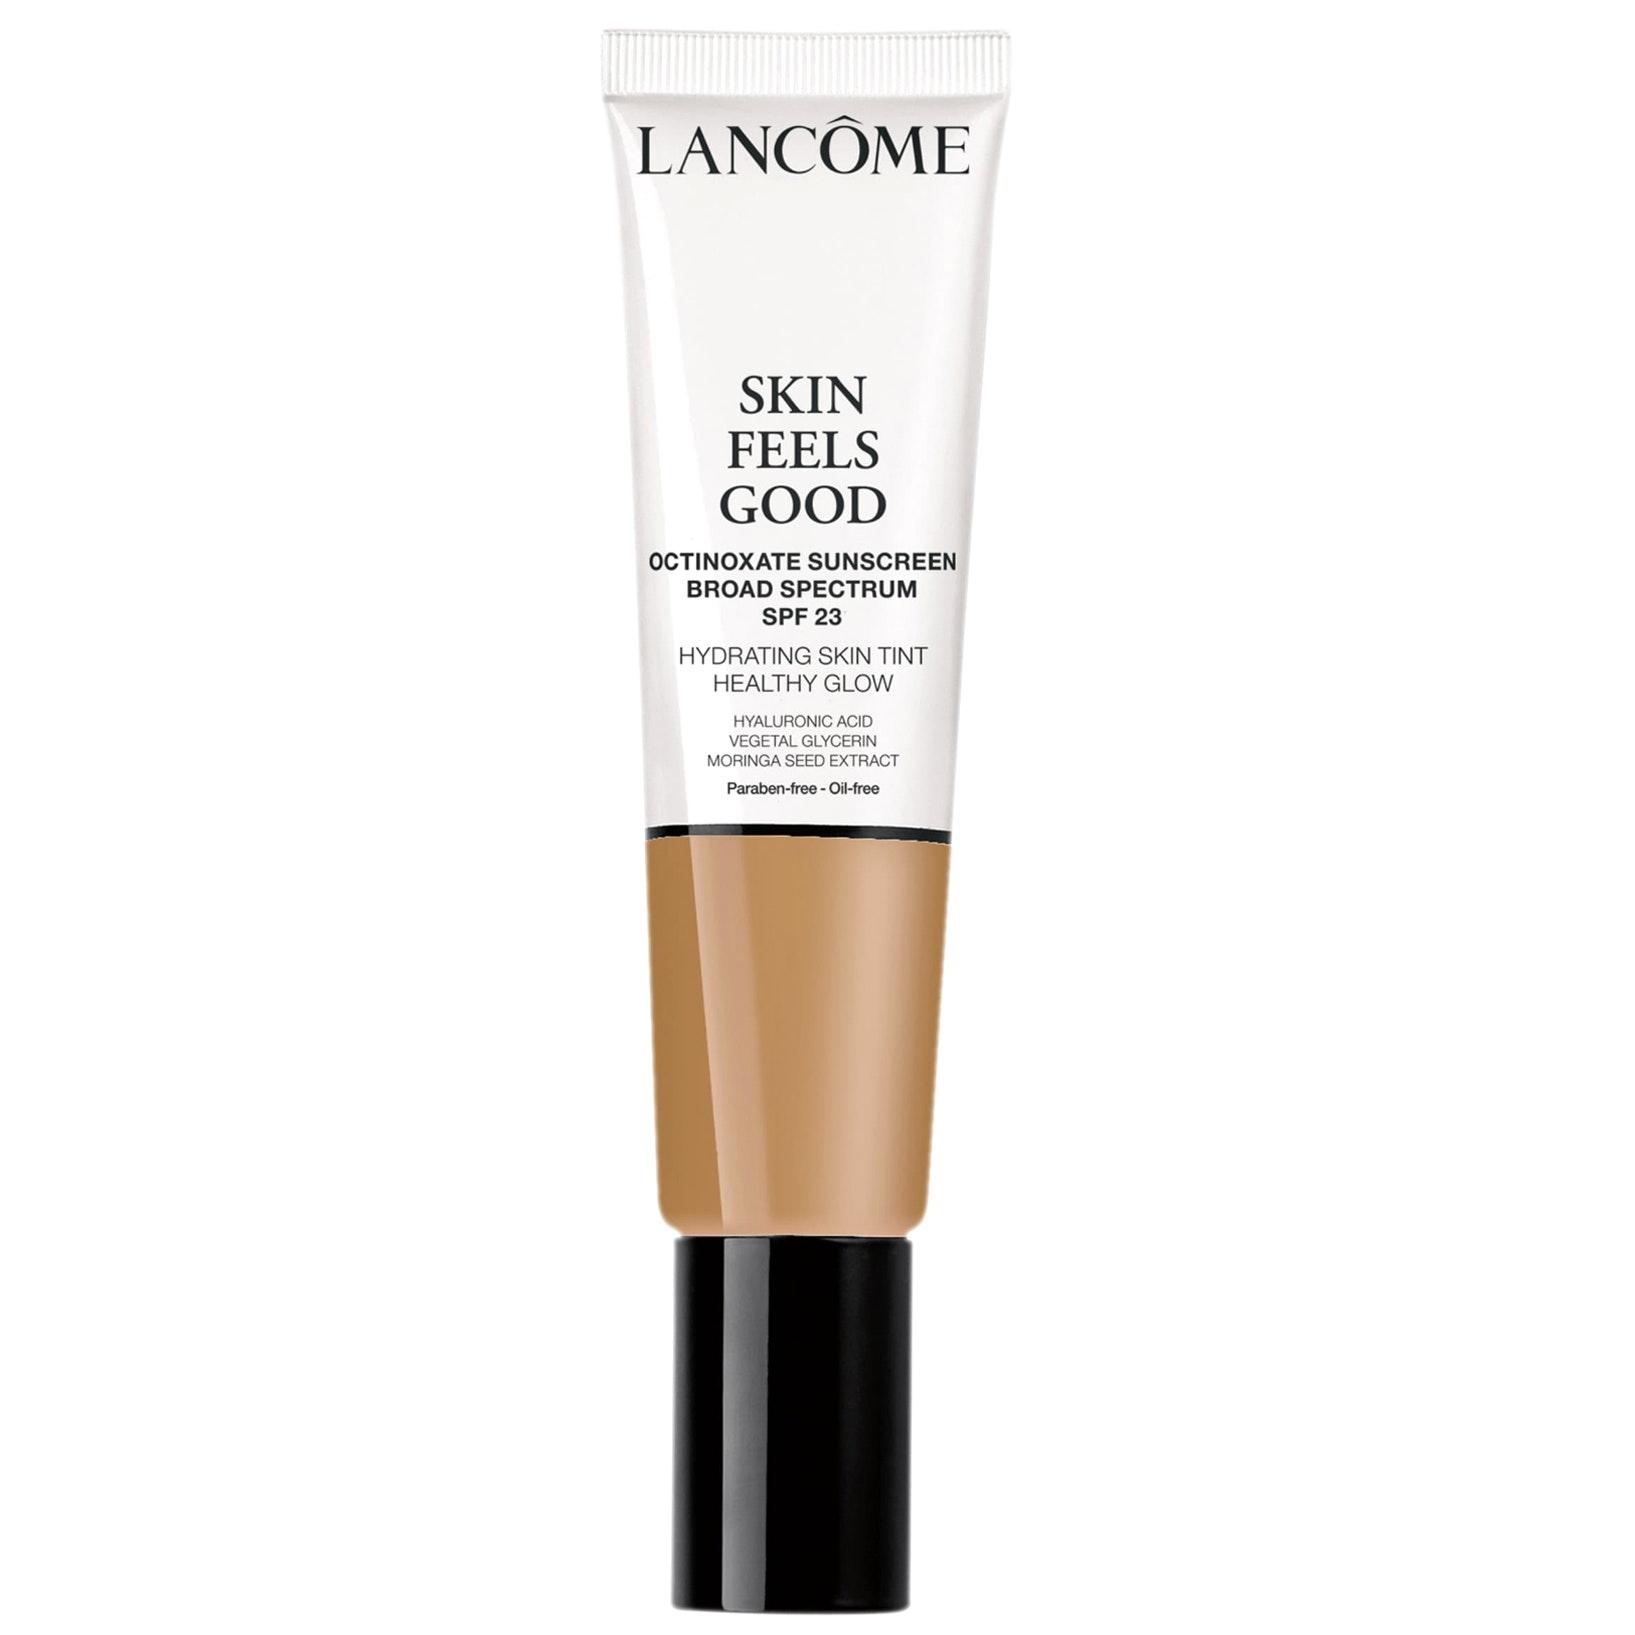 Lancome® Skin Feels Good™ Hydrating Skin Tint